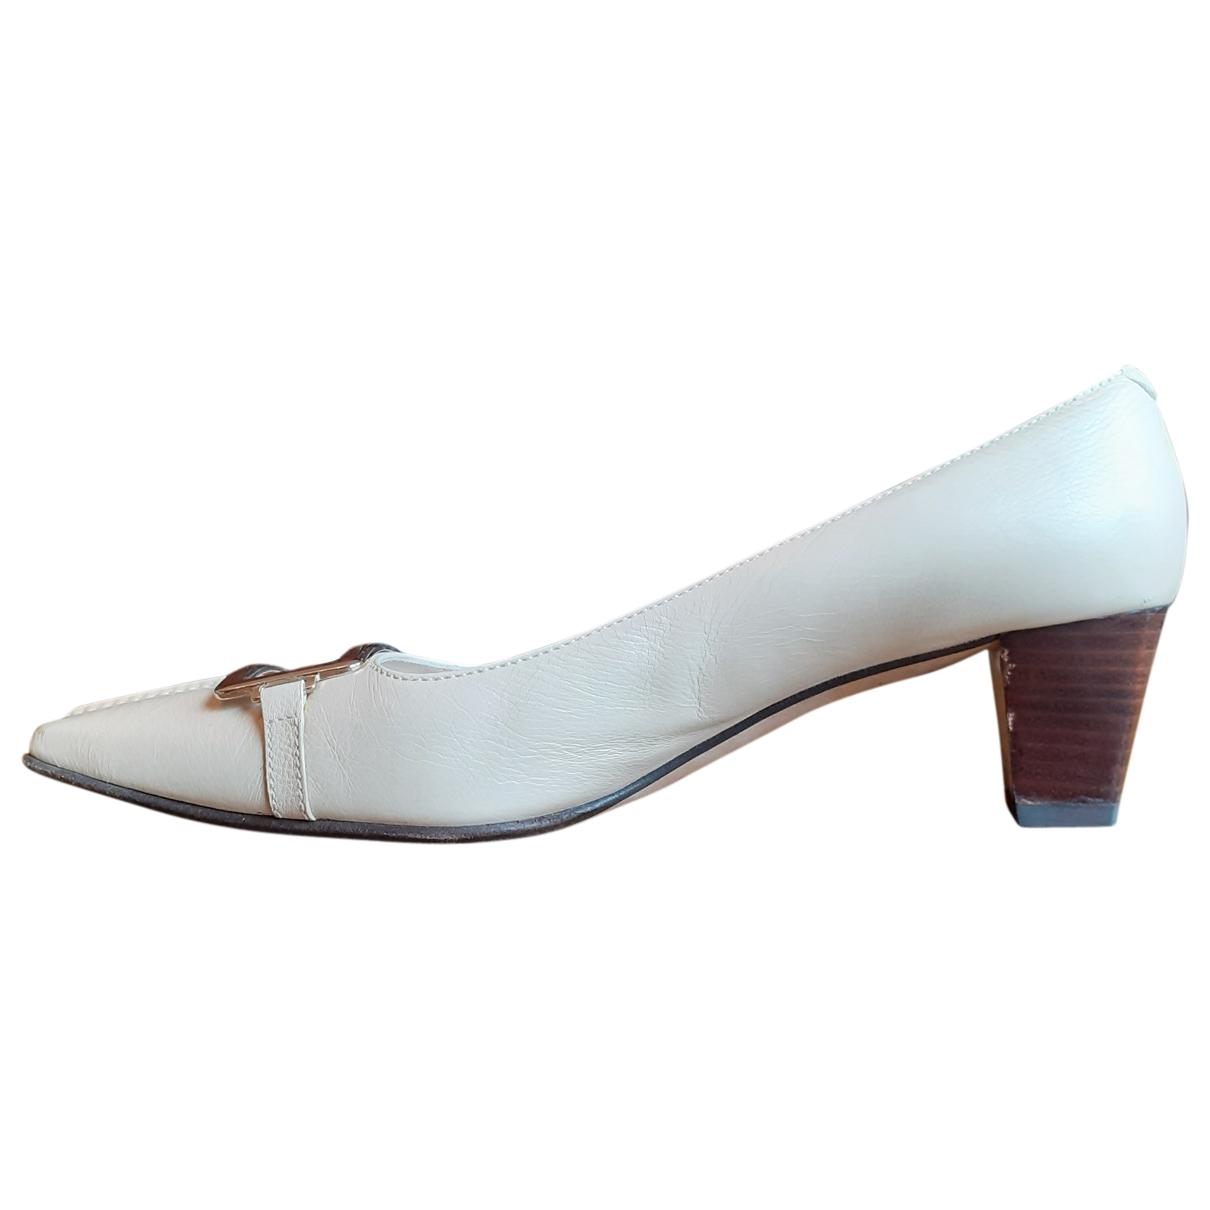 Balenciaga \N Beige Leather Heels for Women 38 EU